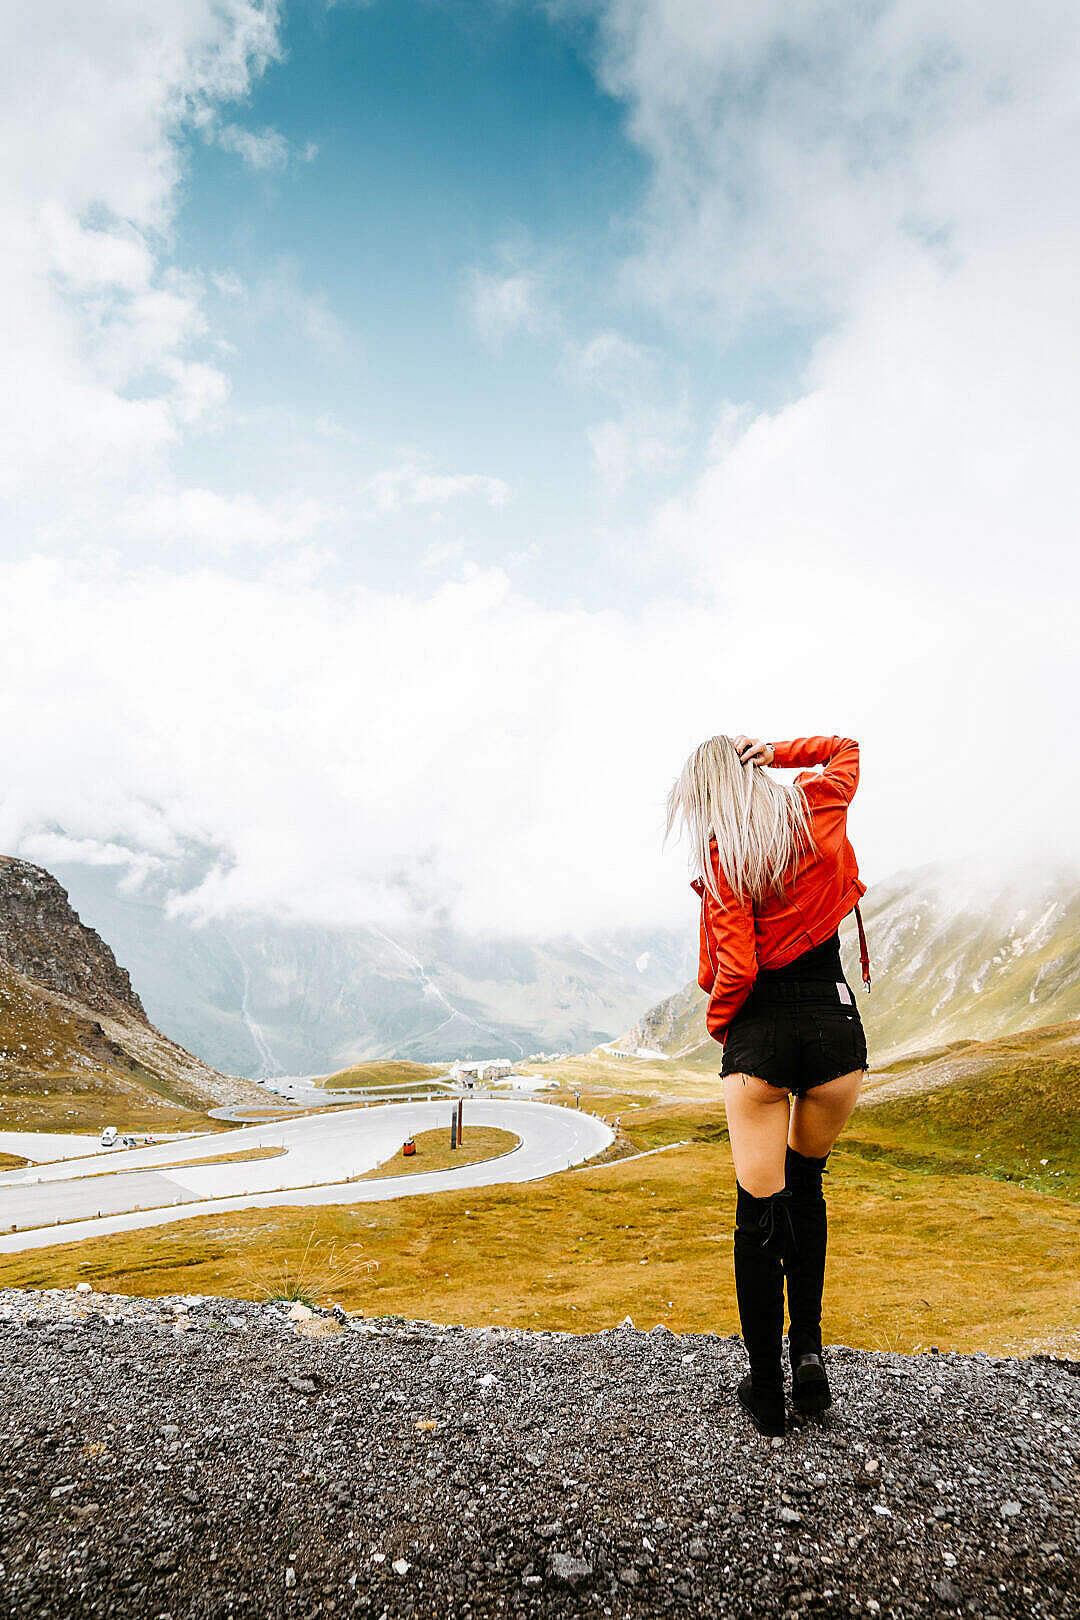 Download Woman Enjoying Grossglockner High Alpine Road in Austria FREE Stock Photo